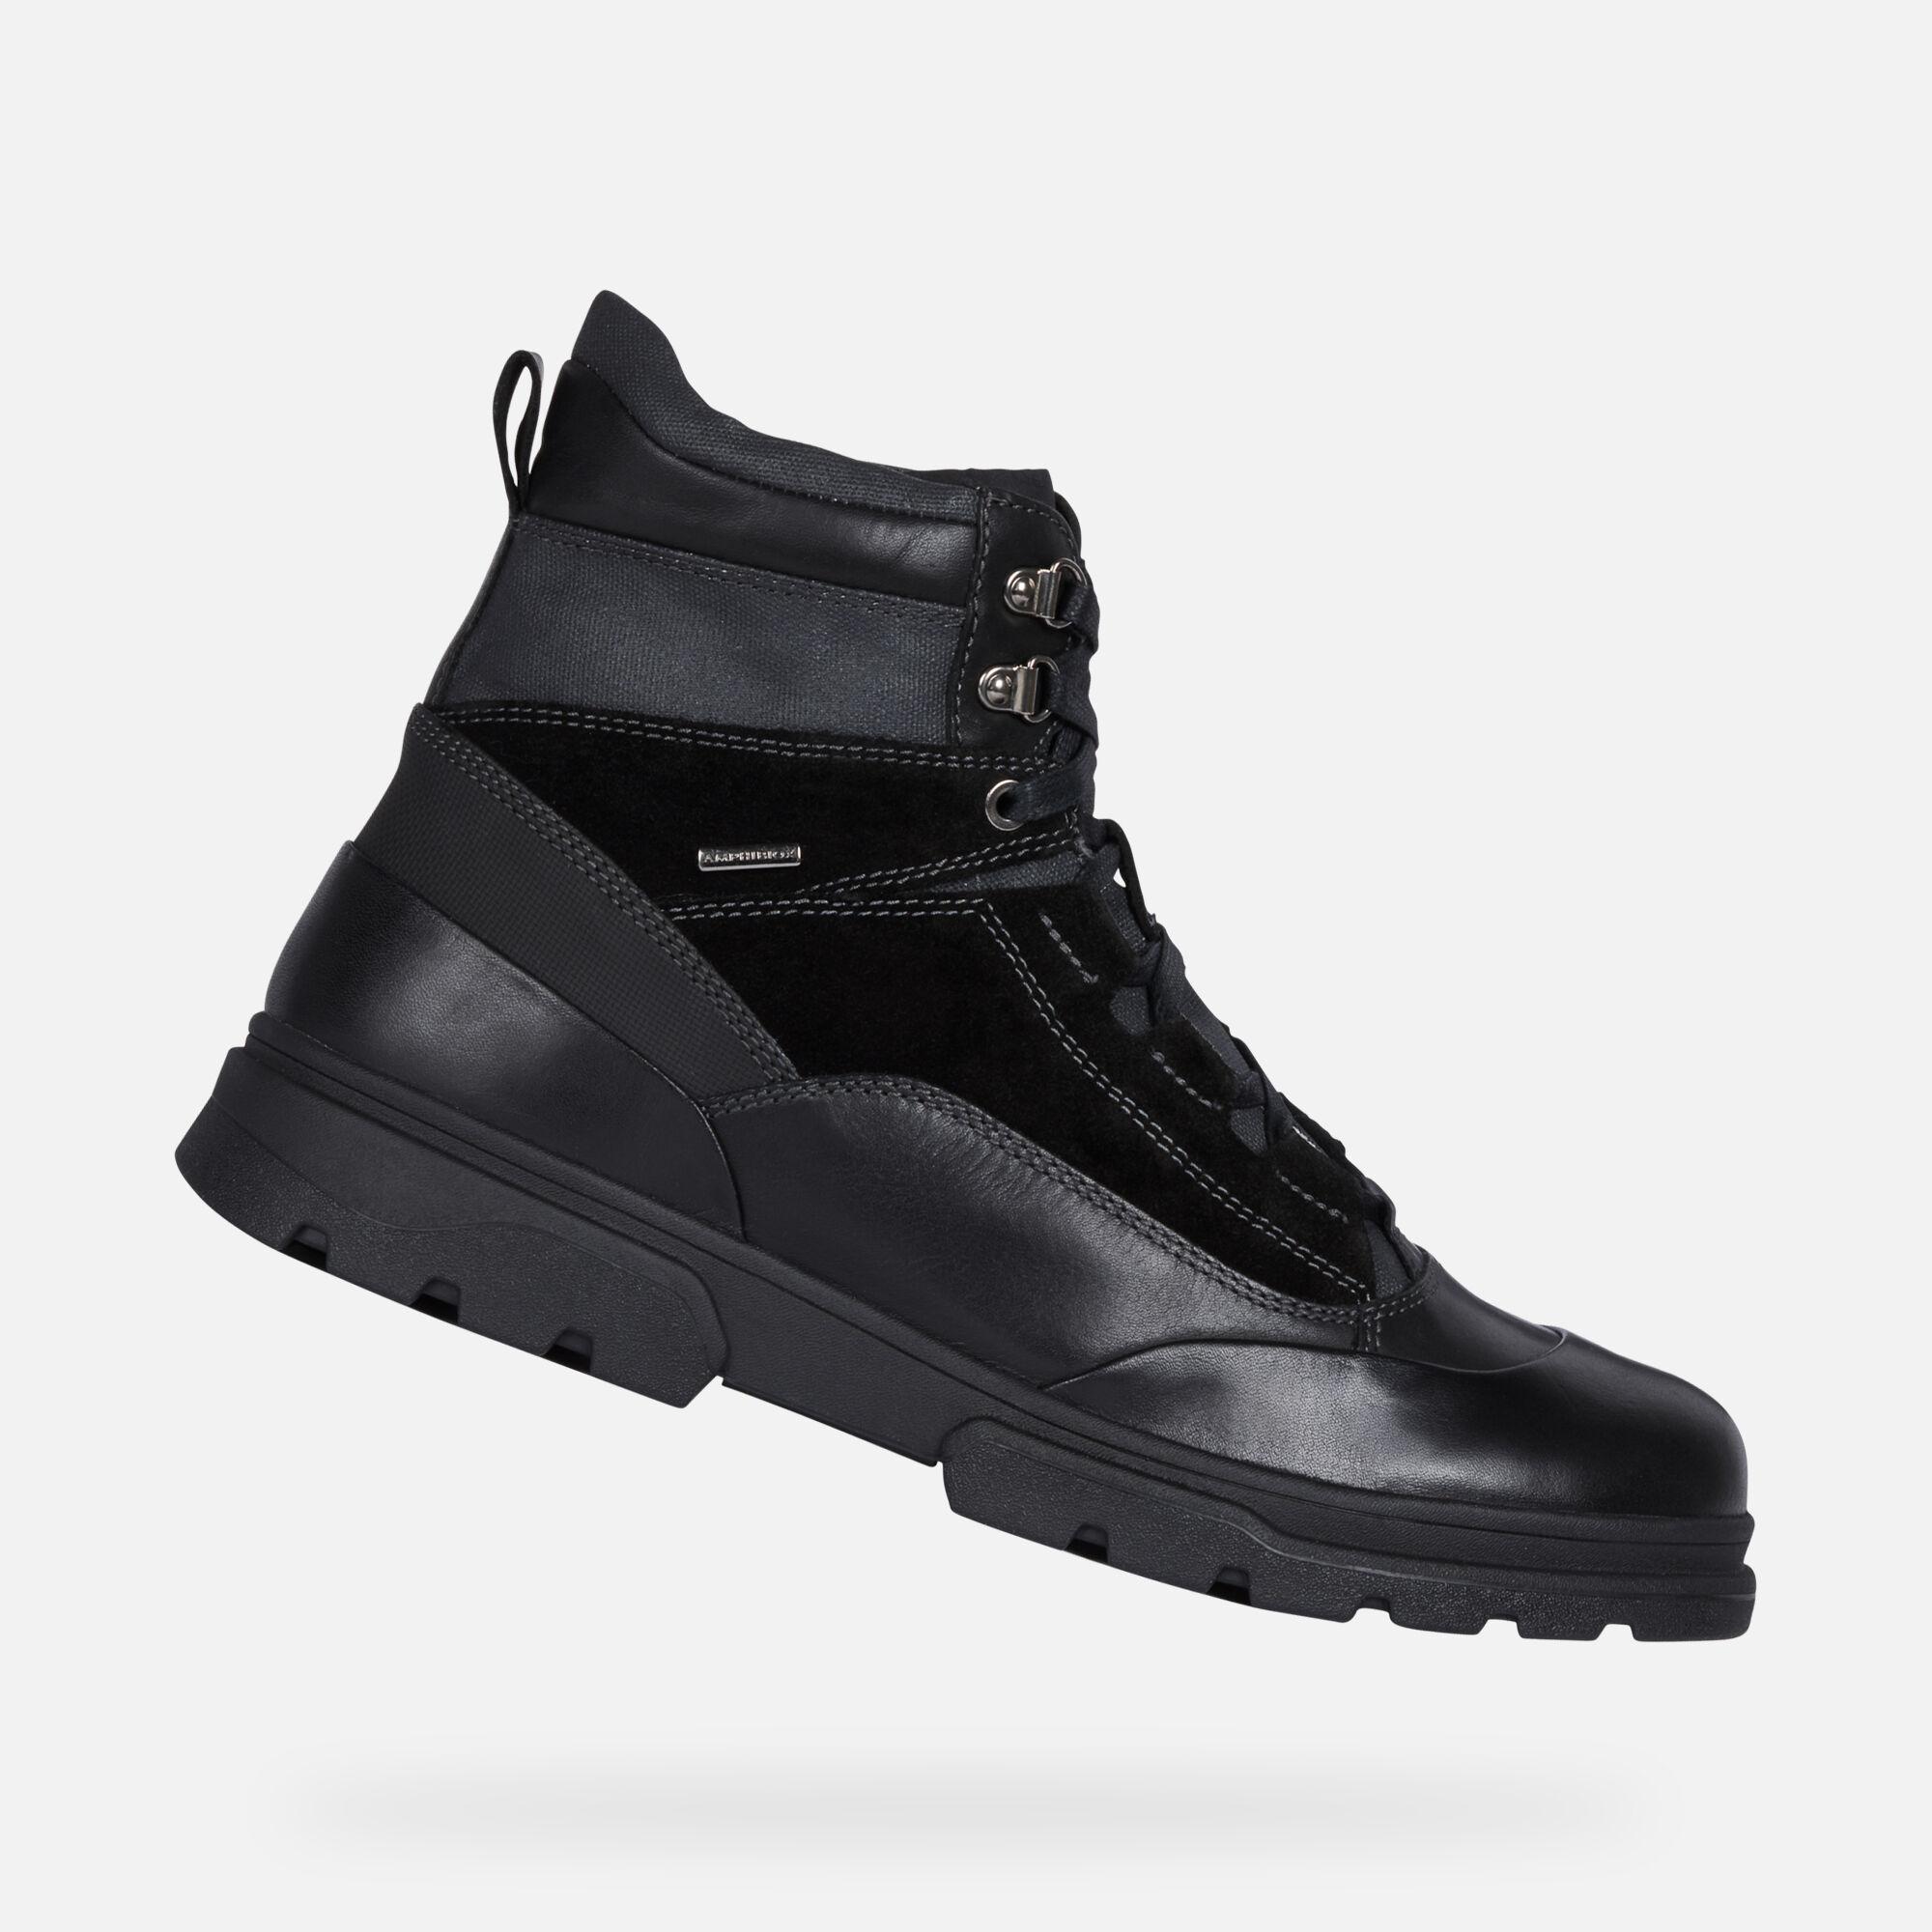 Geox CLINTFORDB ABX Mann: schwarze Stiefeletten | Geox ®